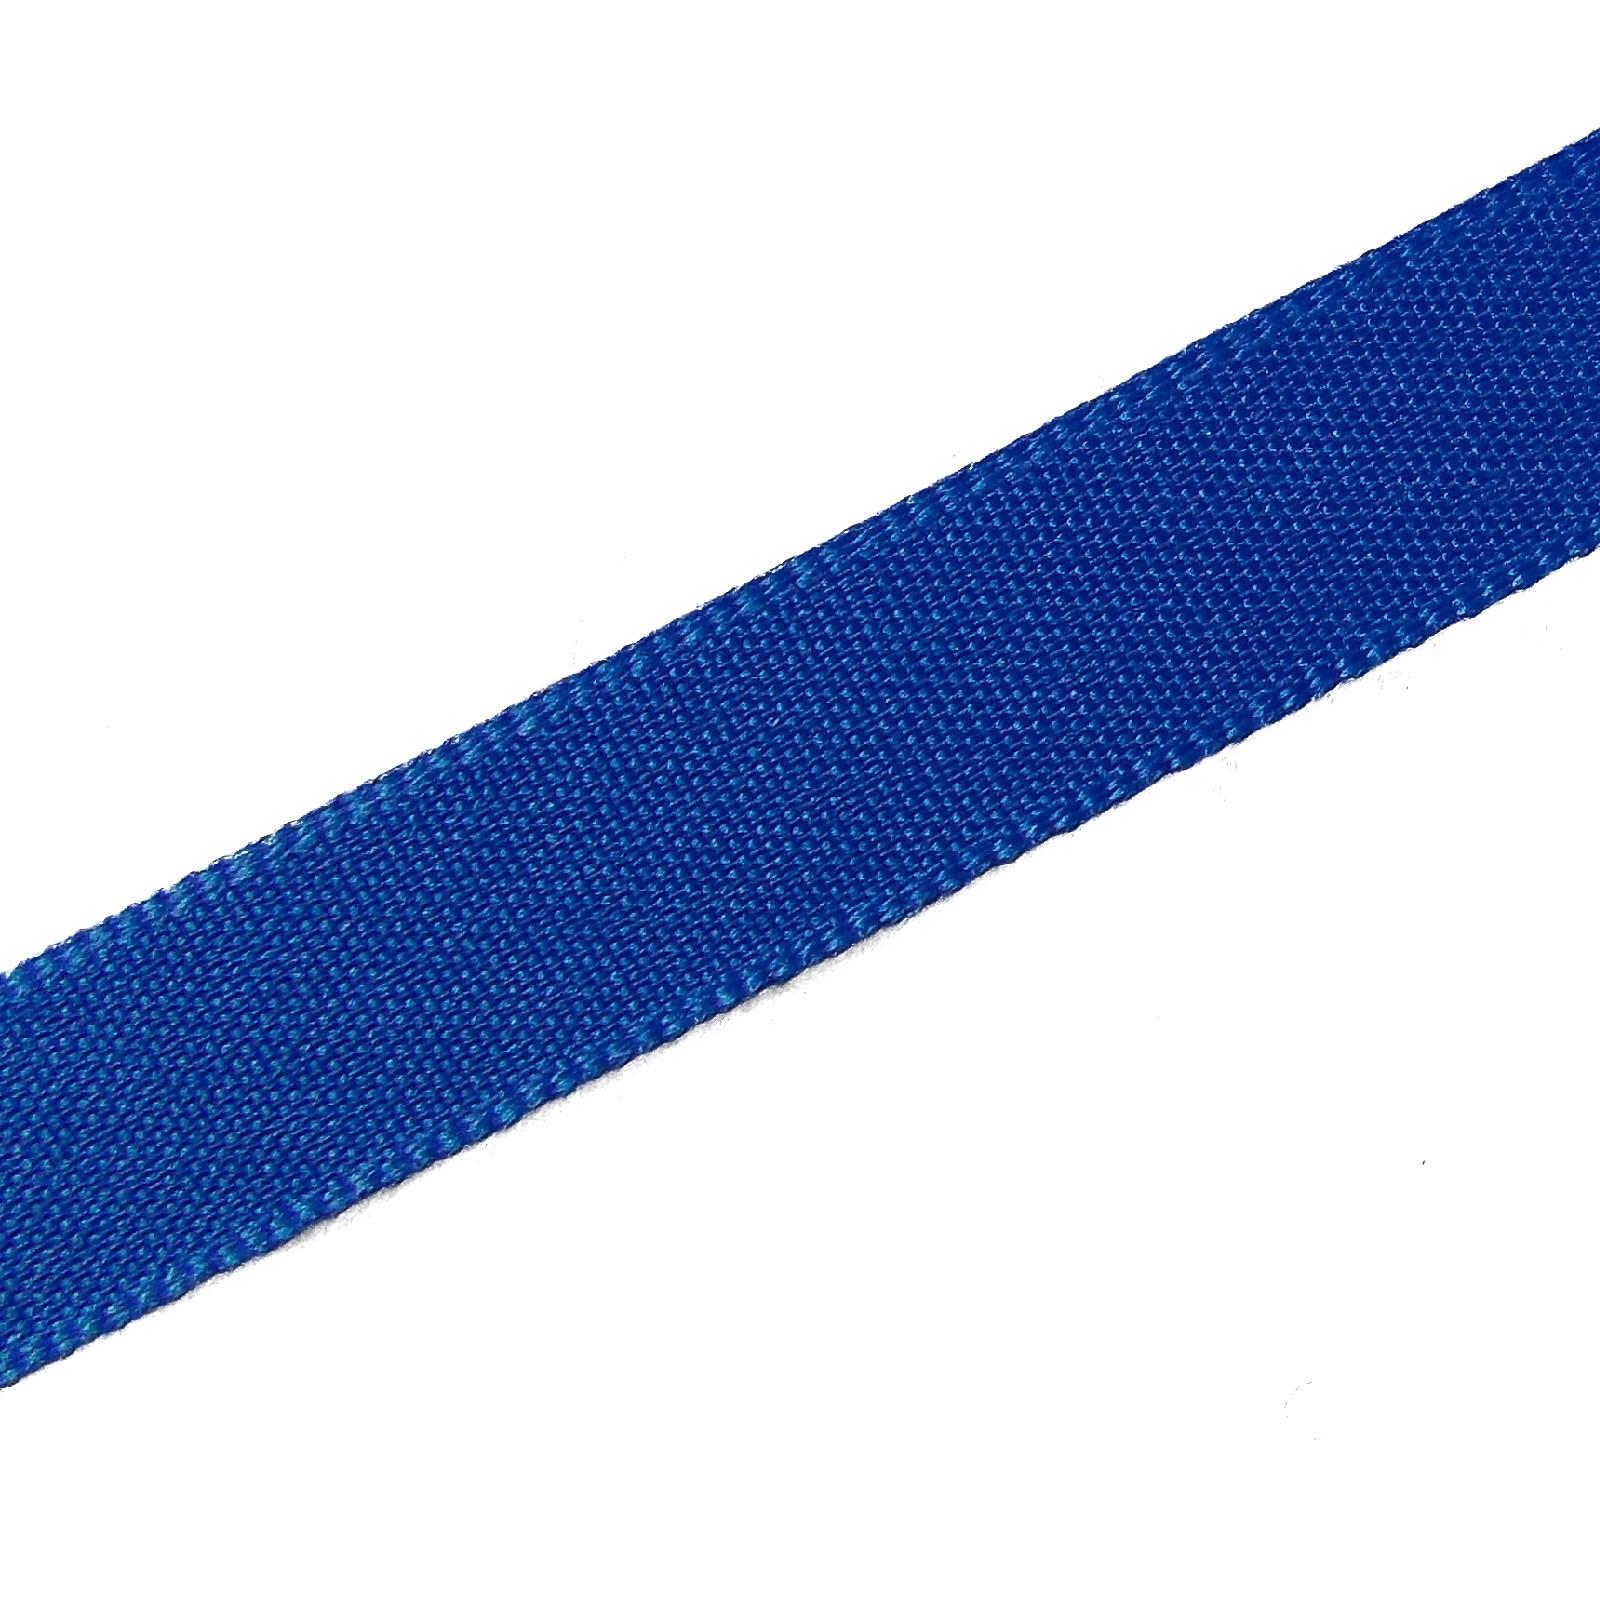 Berisfords Seam Binding Polyester Ribbon Tape 12mm wide Royal Blue 2 metre length